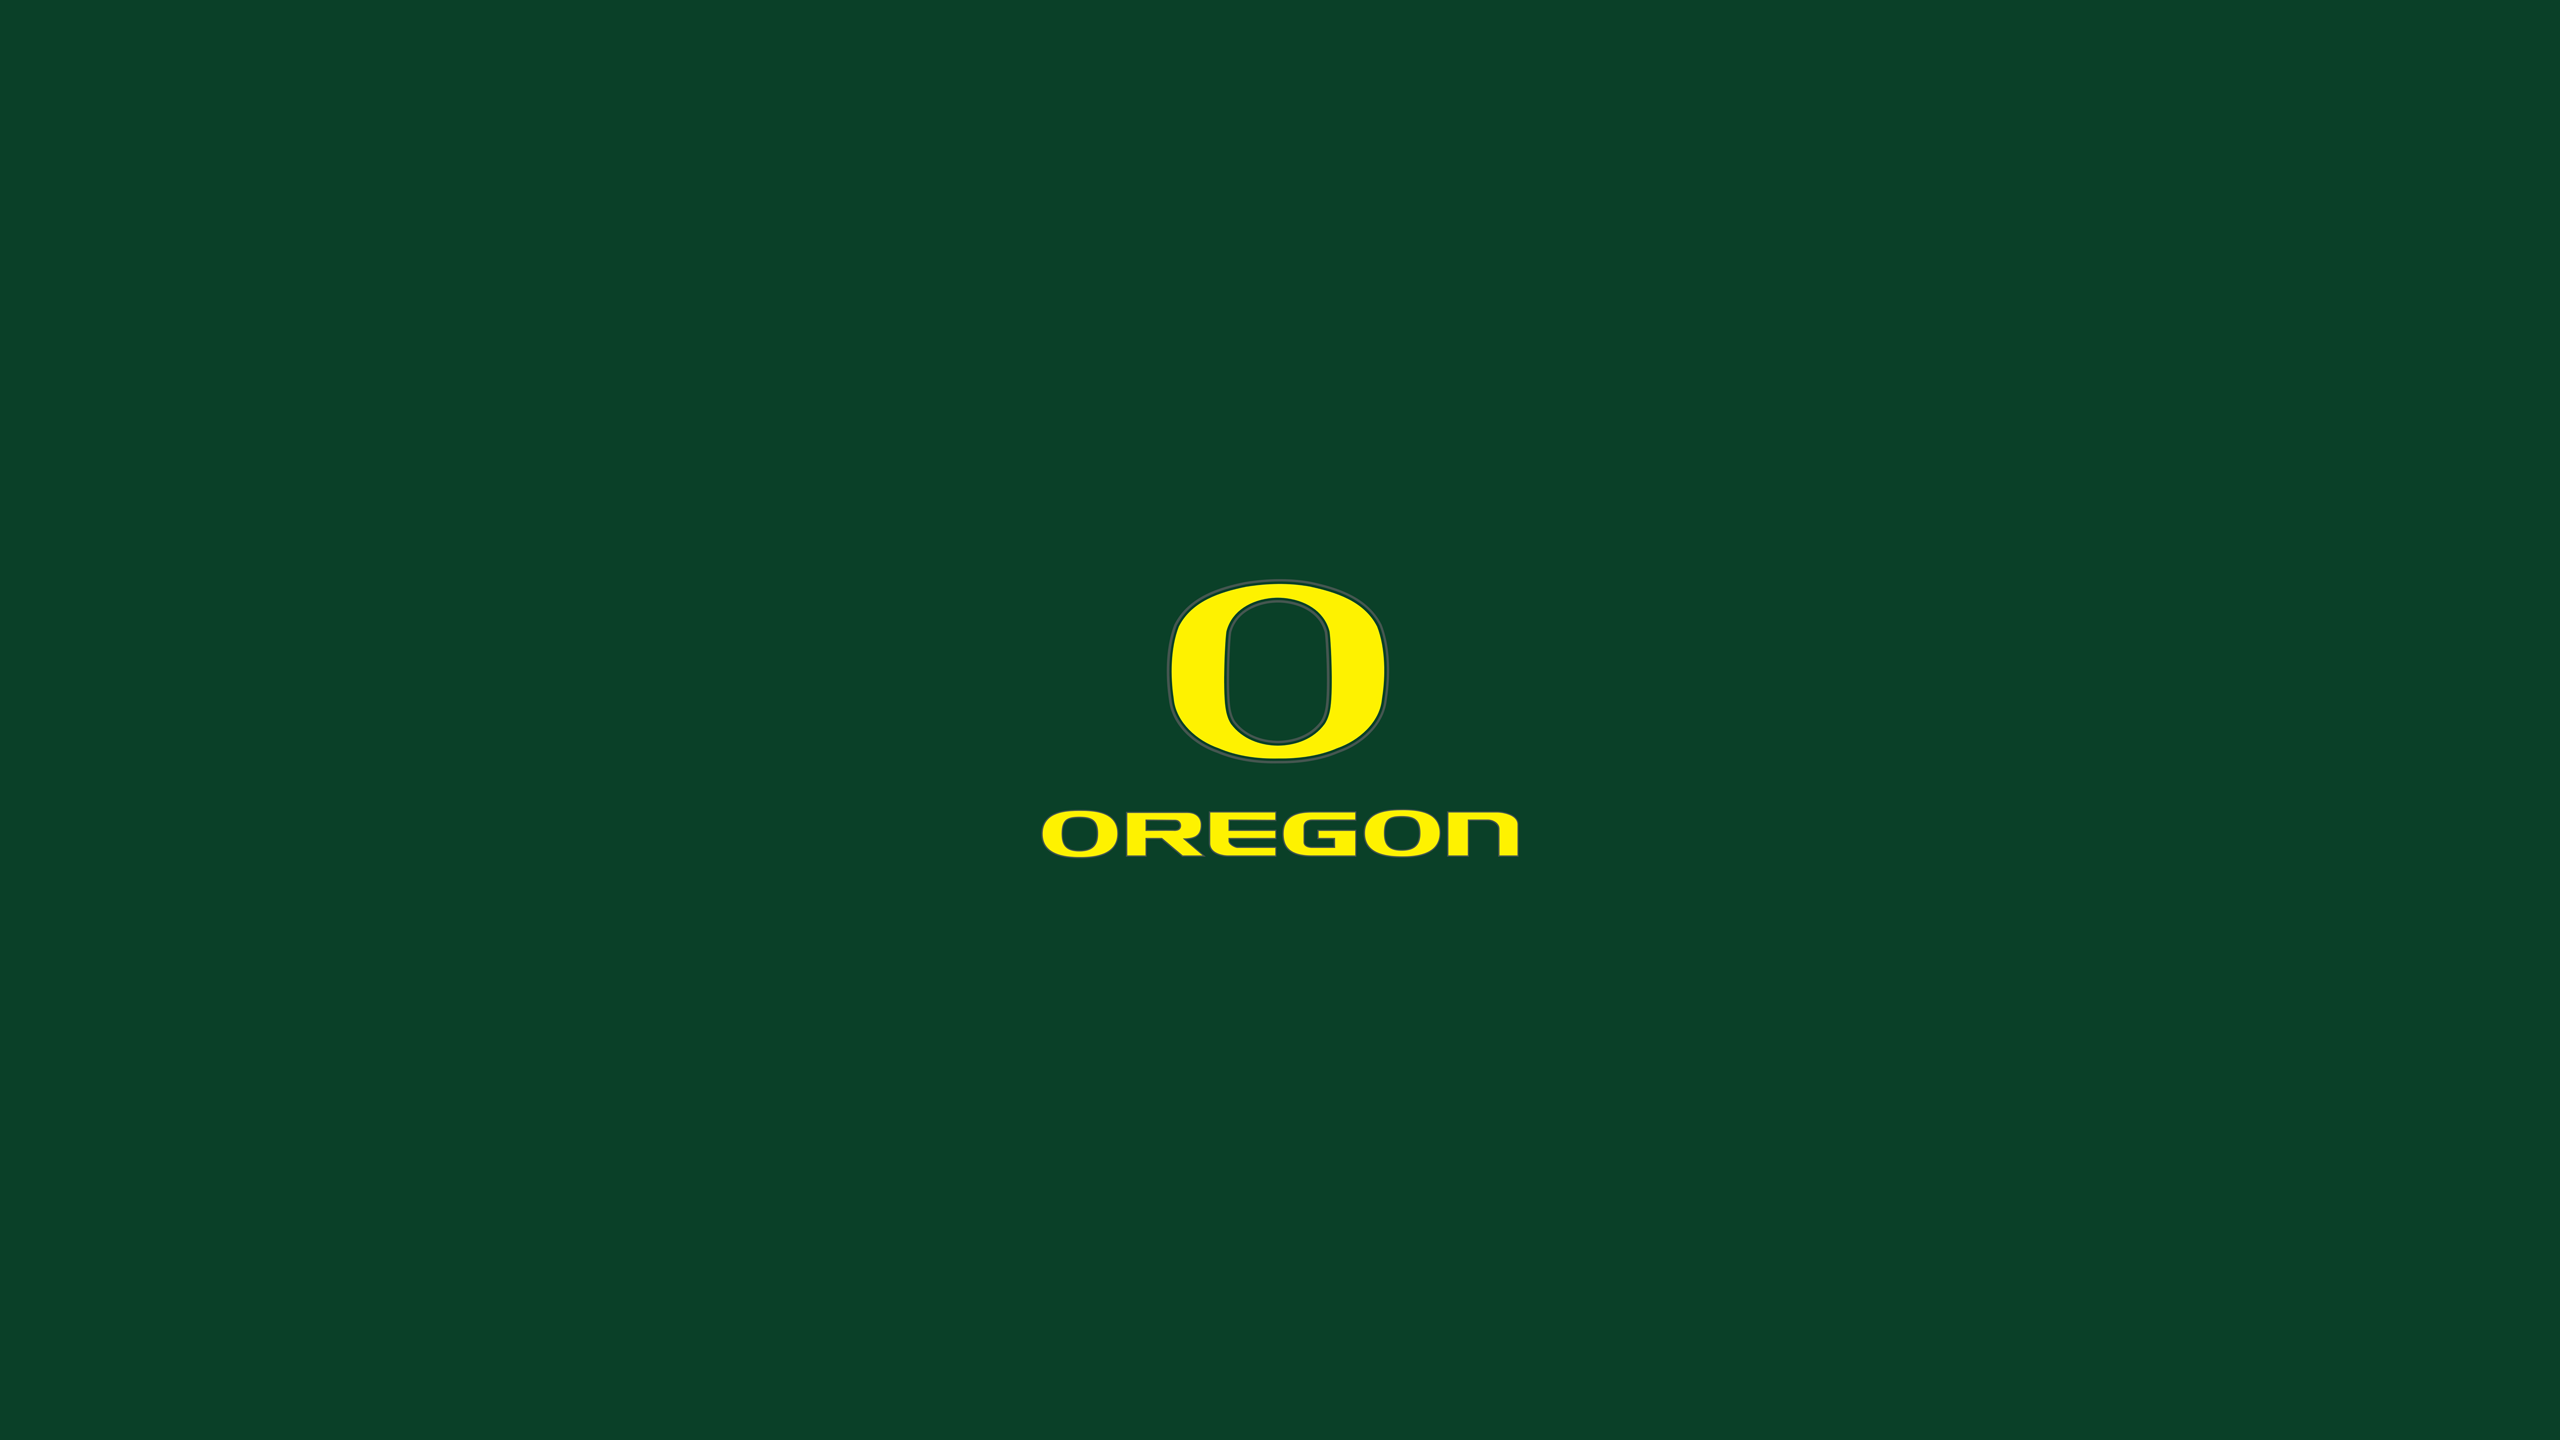 44] University of Oregon Ducks Wallpaper on WallpaperSafari 2560x1440